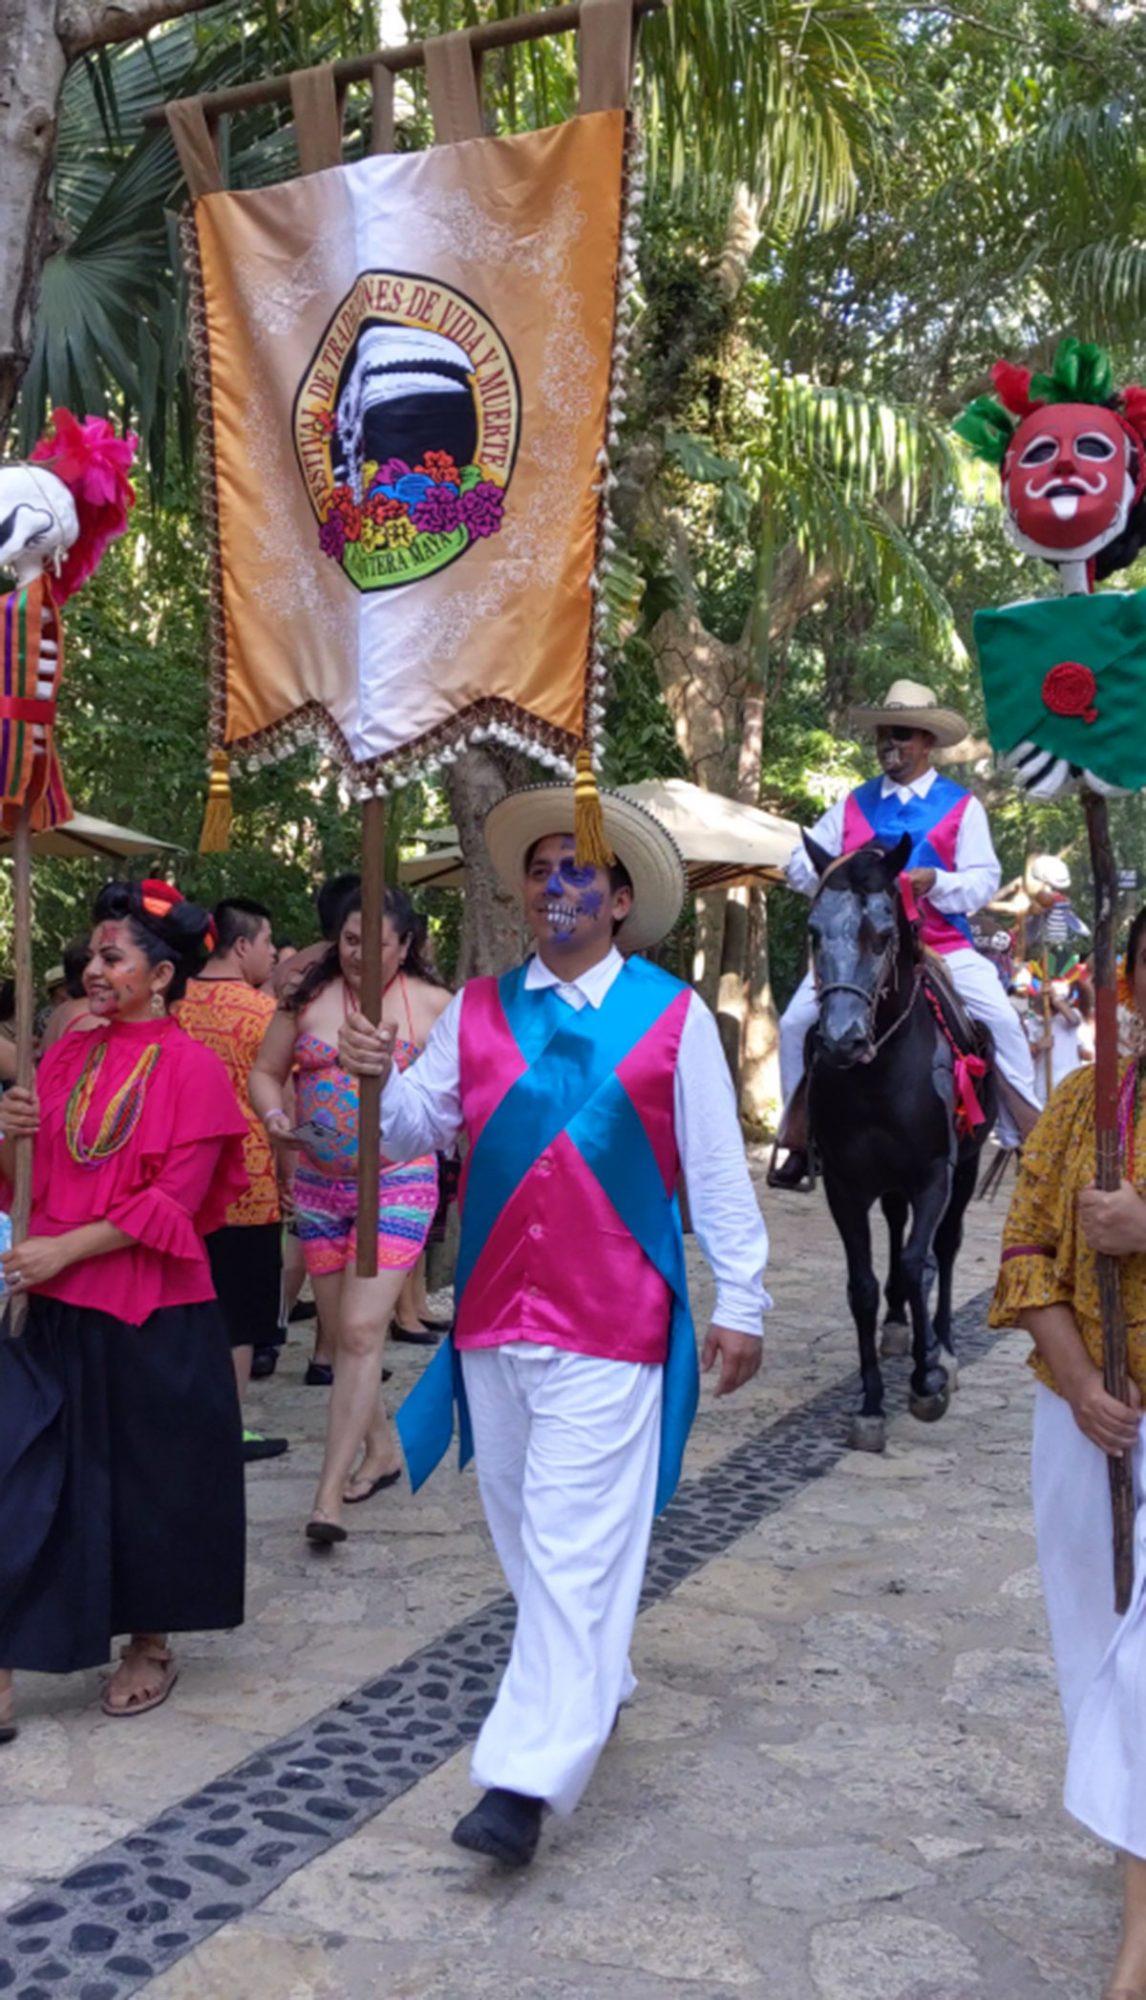 Festival Vida y Muerte Xcaret